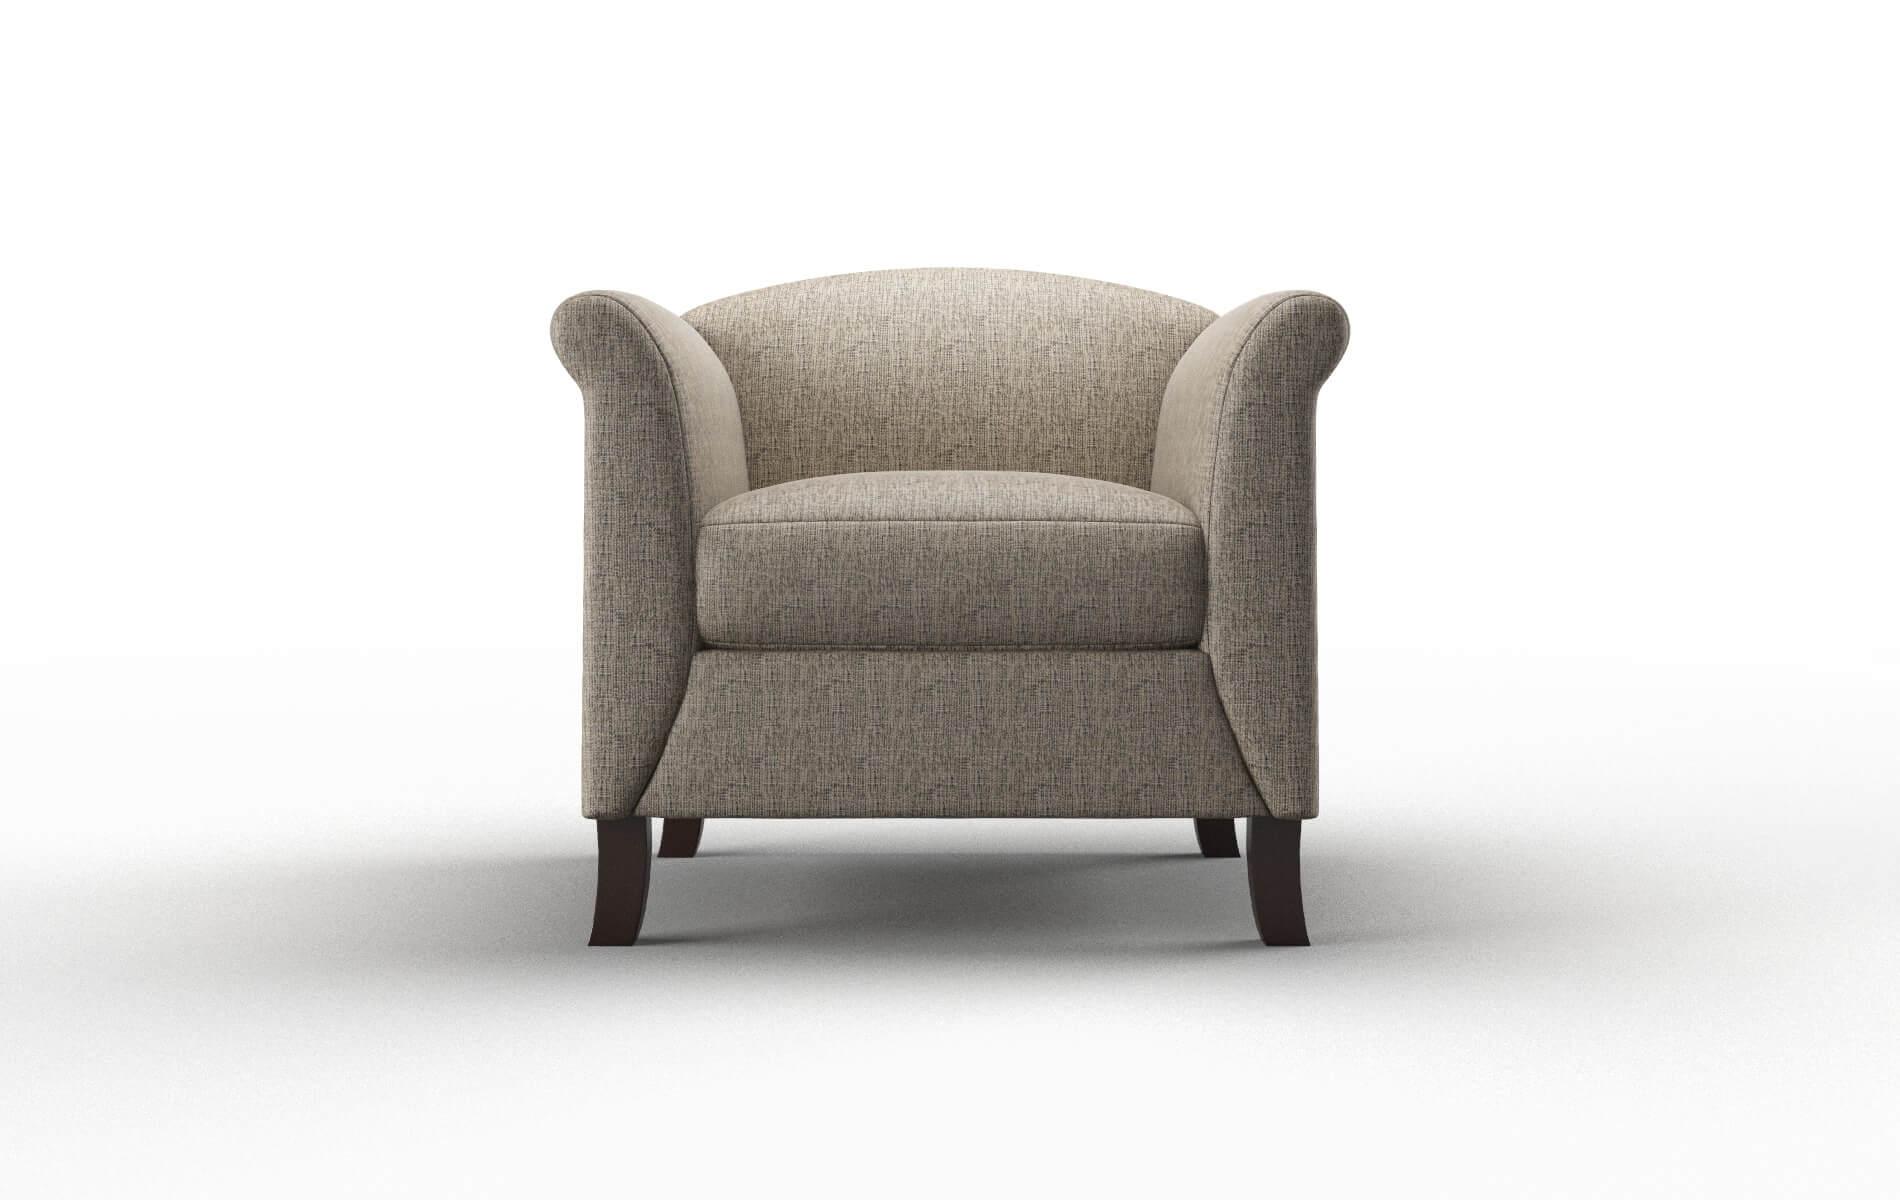 Crete Solifestyle 51 Chair espresso legs 1